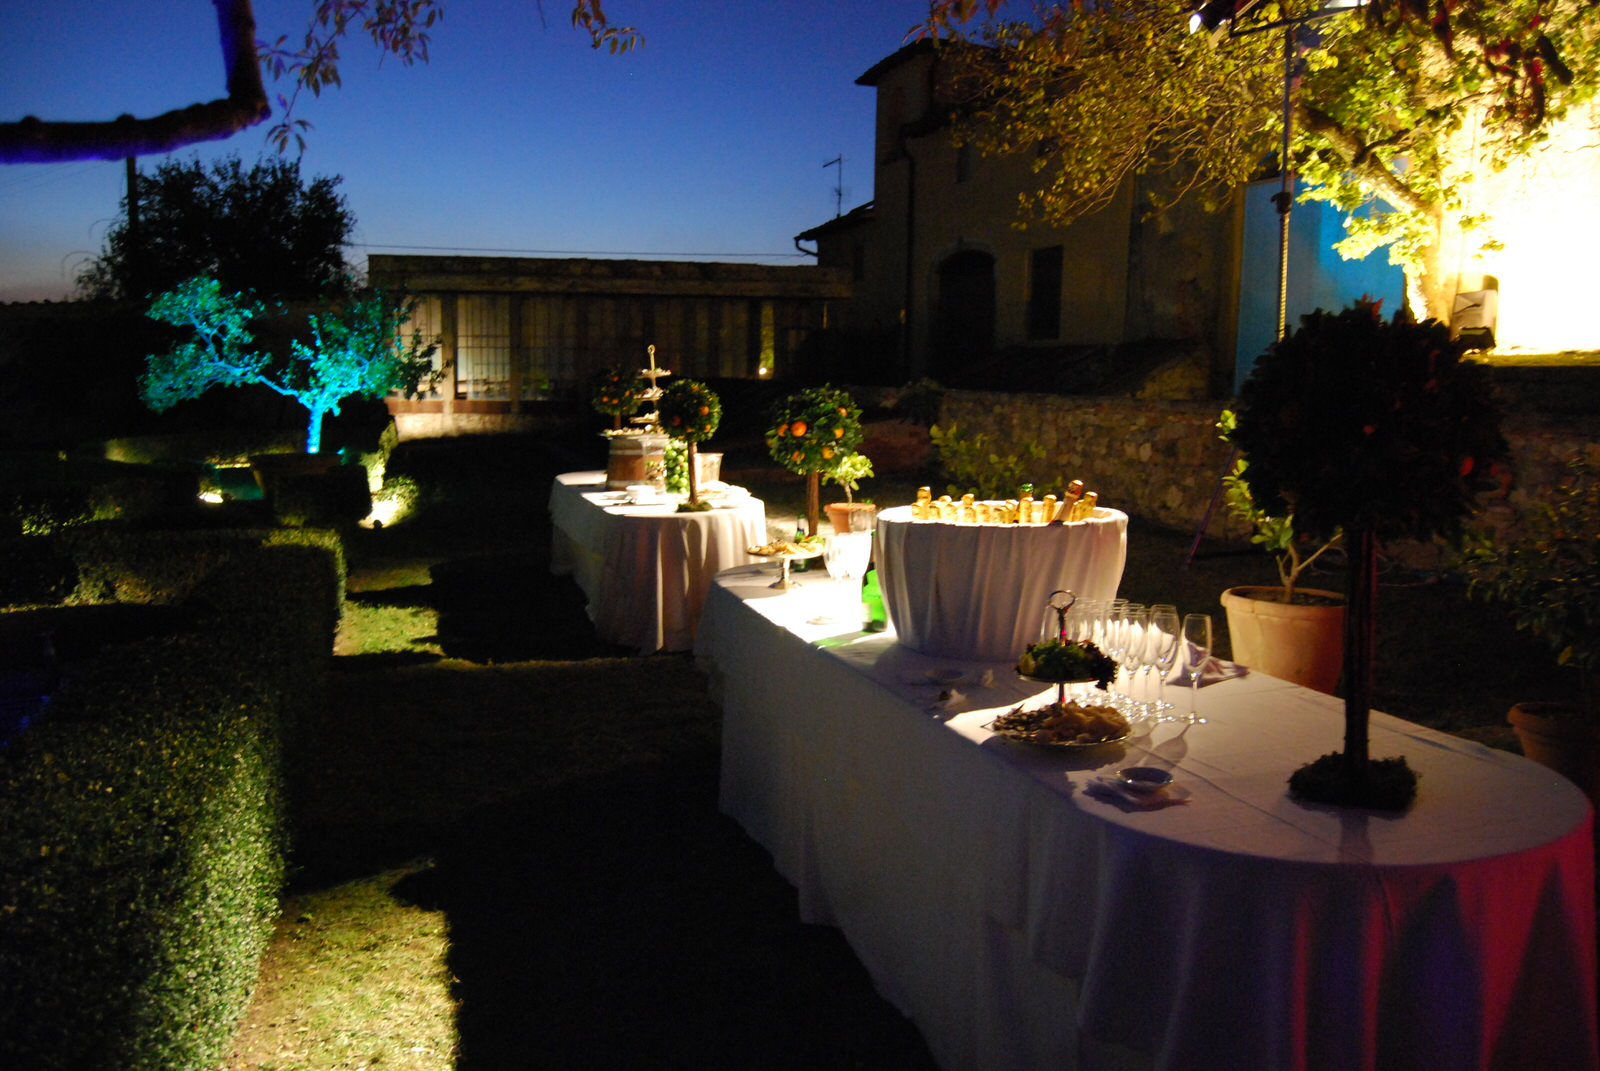 tuscany-wedding-planners-lightsound-04.jpg